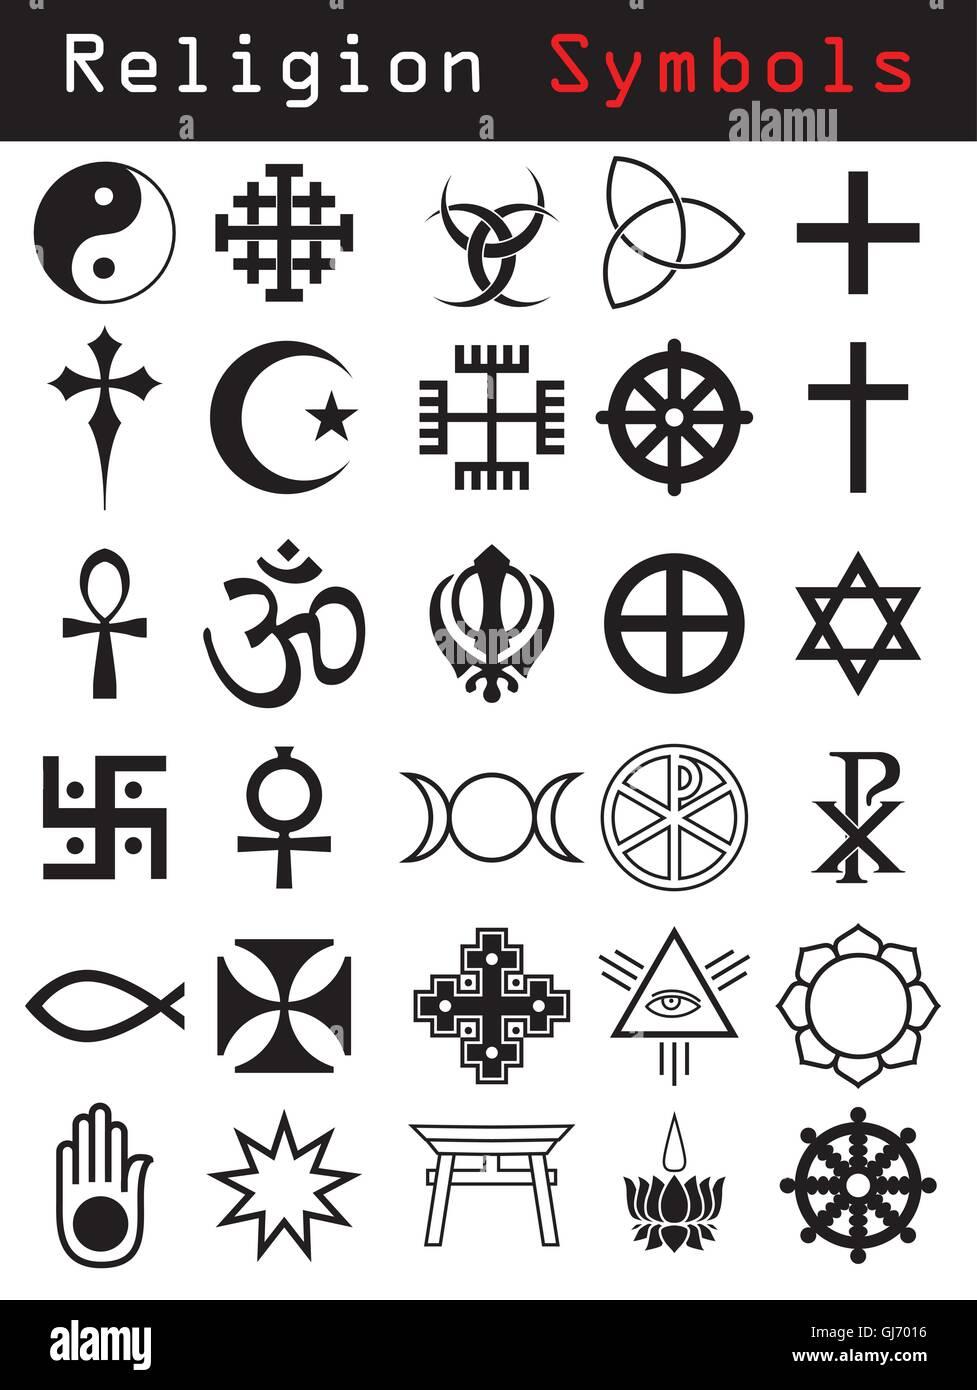 Religion symbols - Stock Image